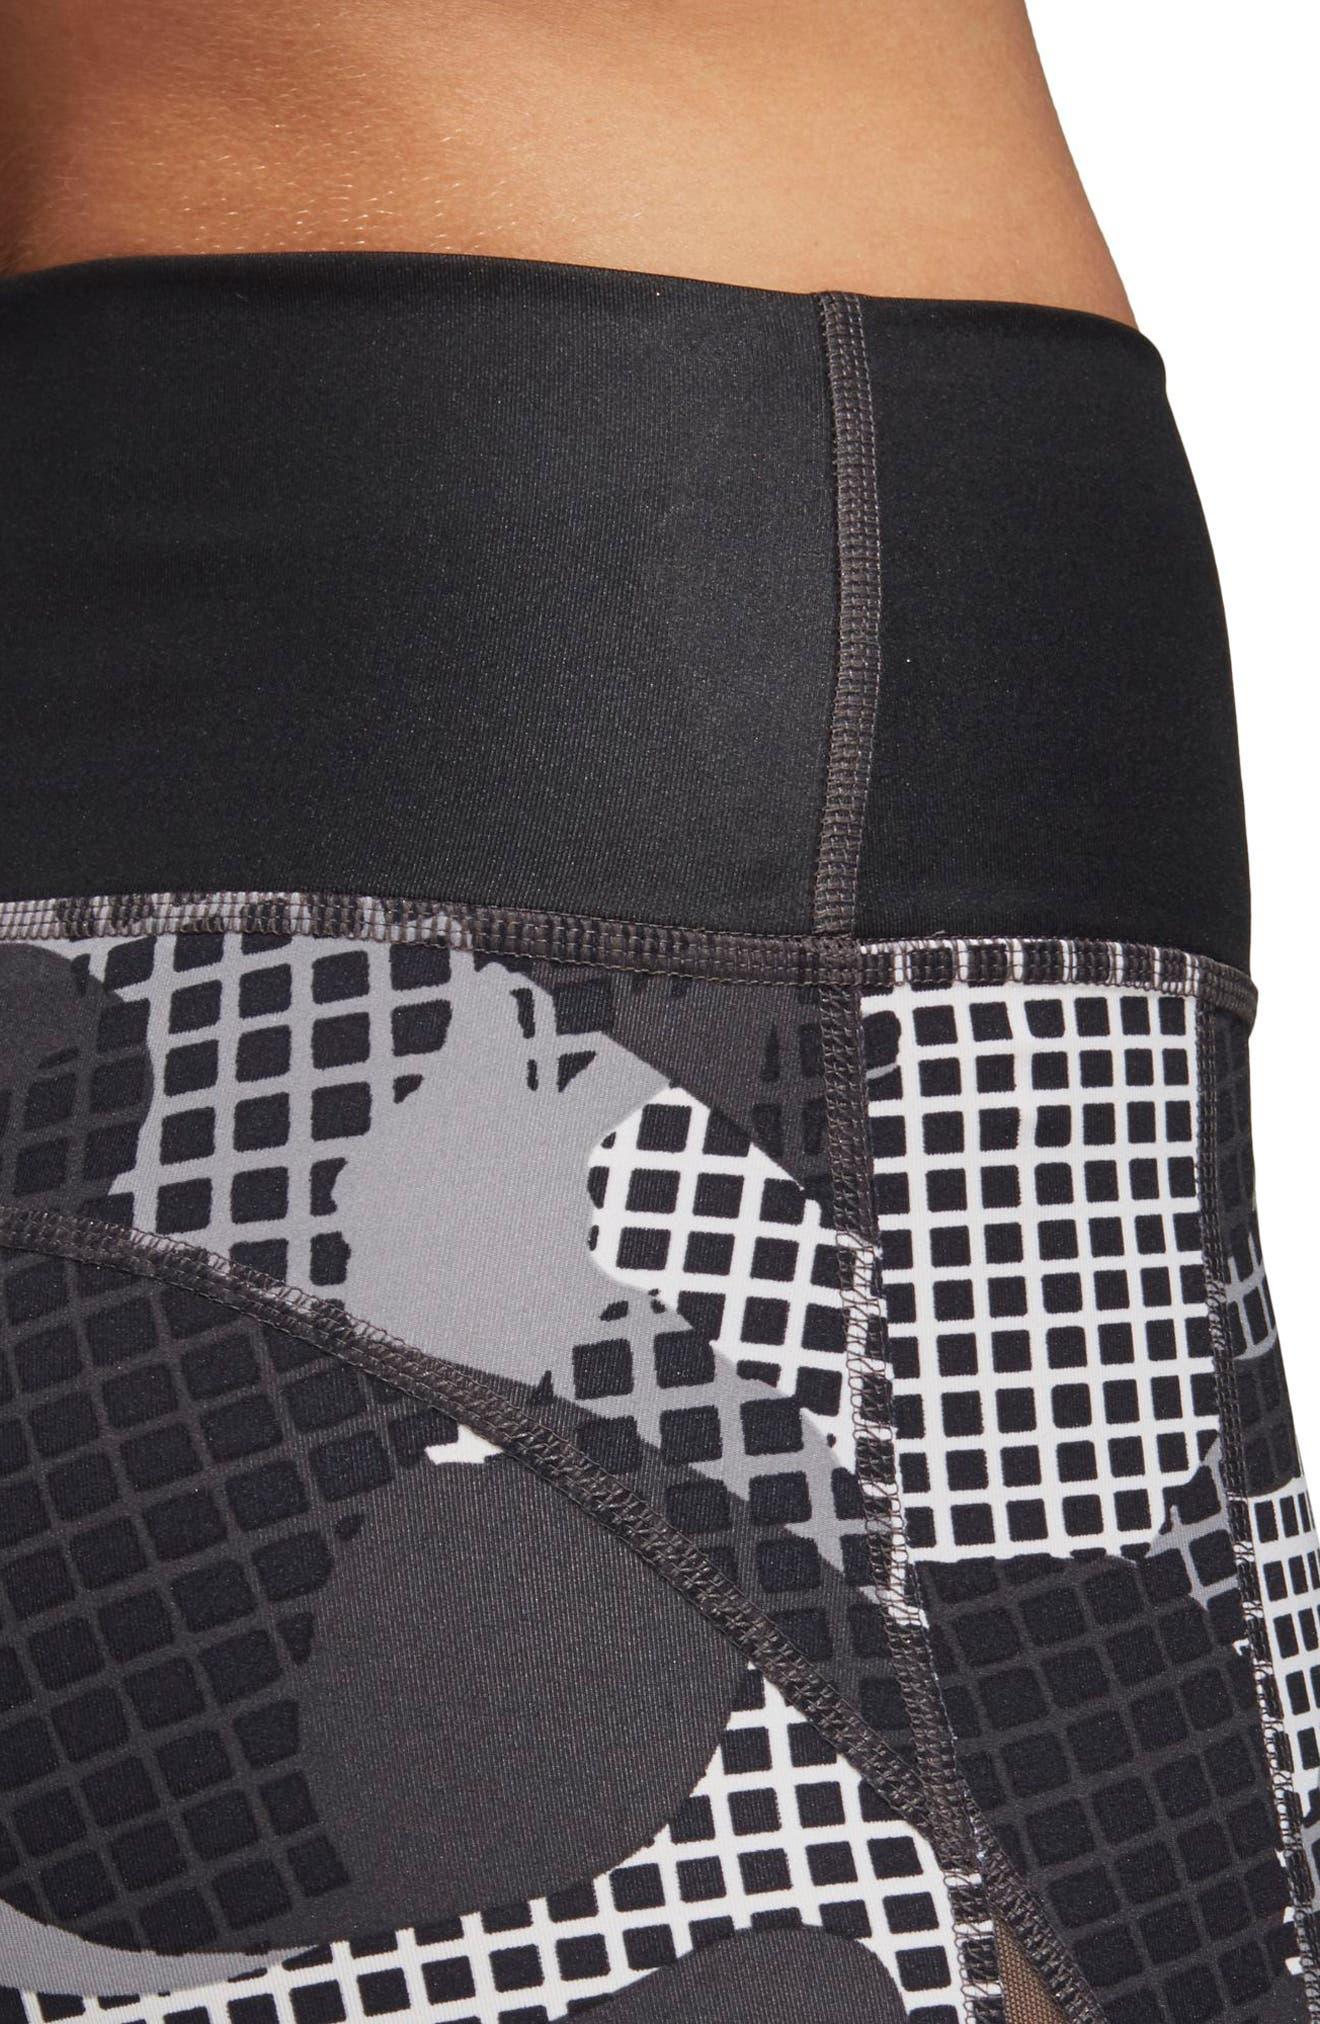 Heatracer Leggings,                             Alternate thumbnail 5, color,                             BLACK/ PRINT